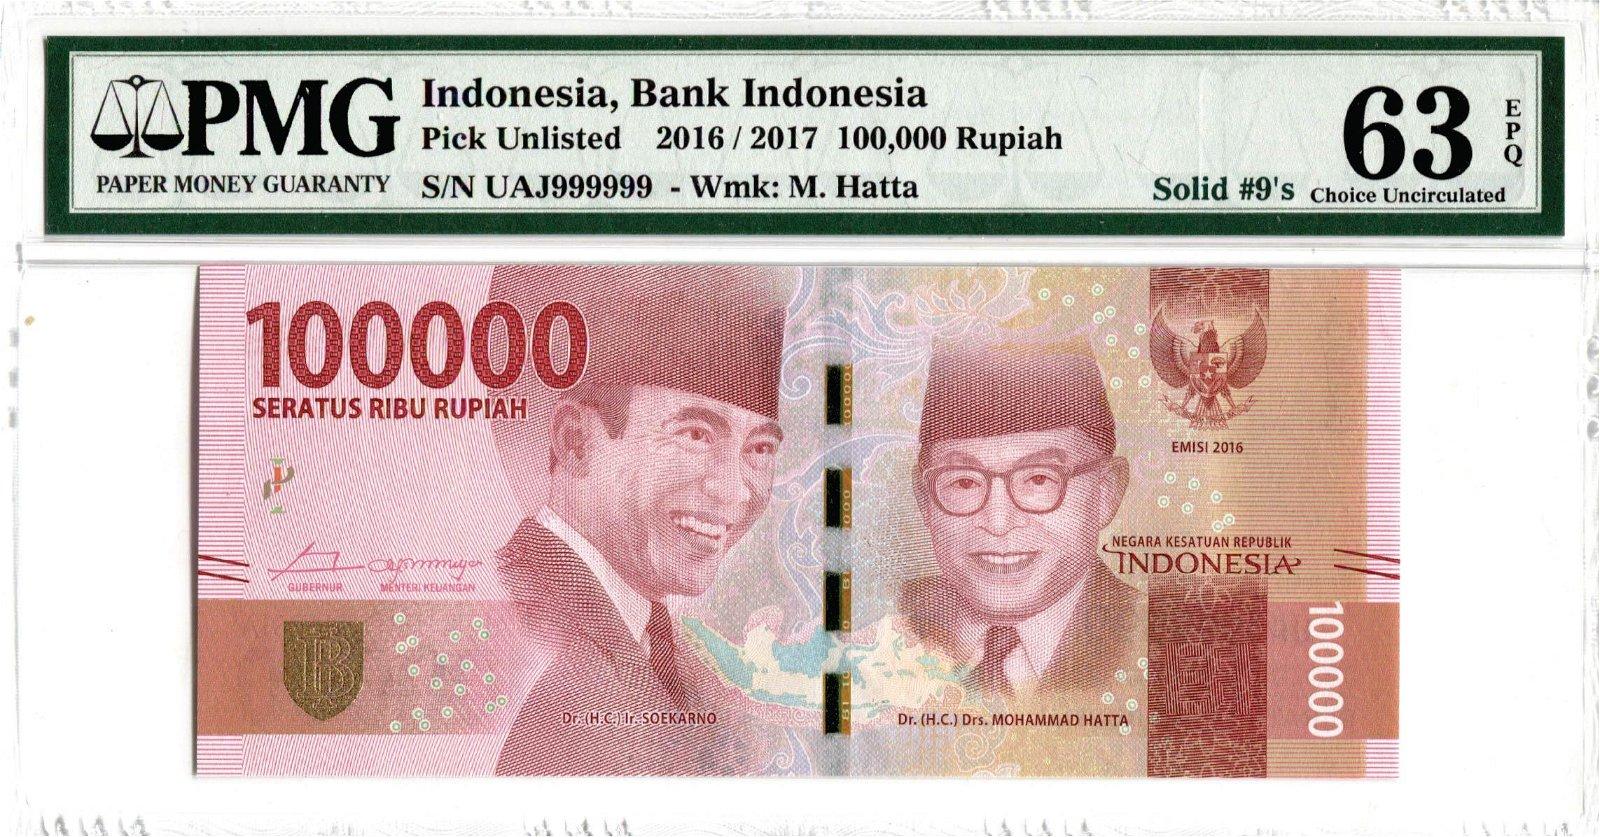 Indonesia 2016/17, 100,000 Rupiah Solid 9